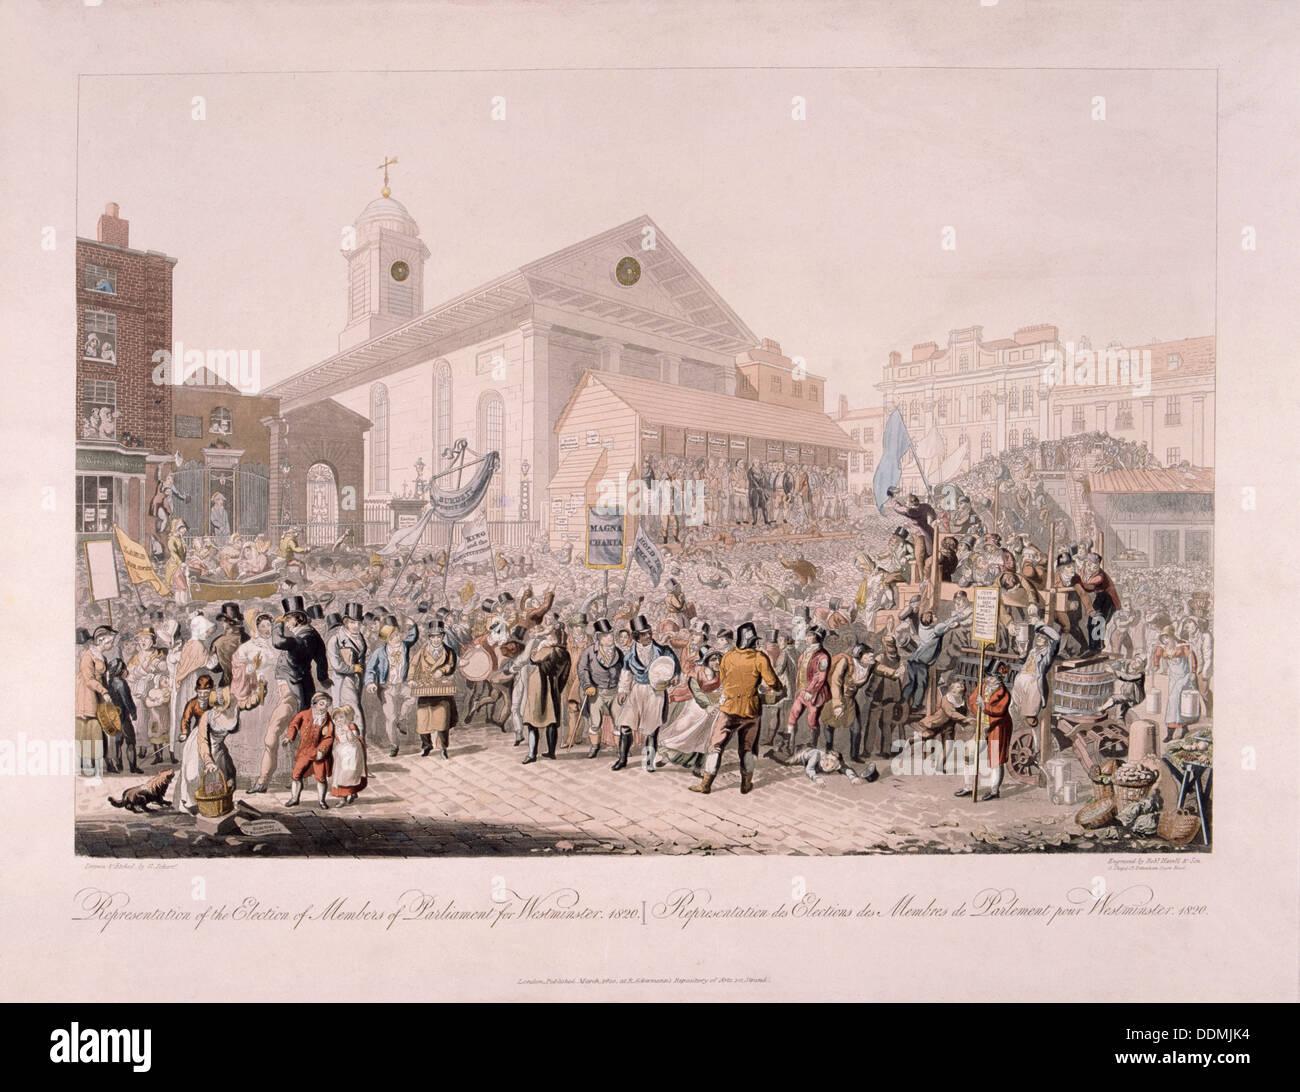 Election in Covent Garden, London, 1818. Artist: Rudolph Ackermann - Stock  Image